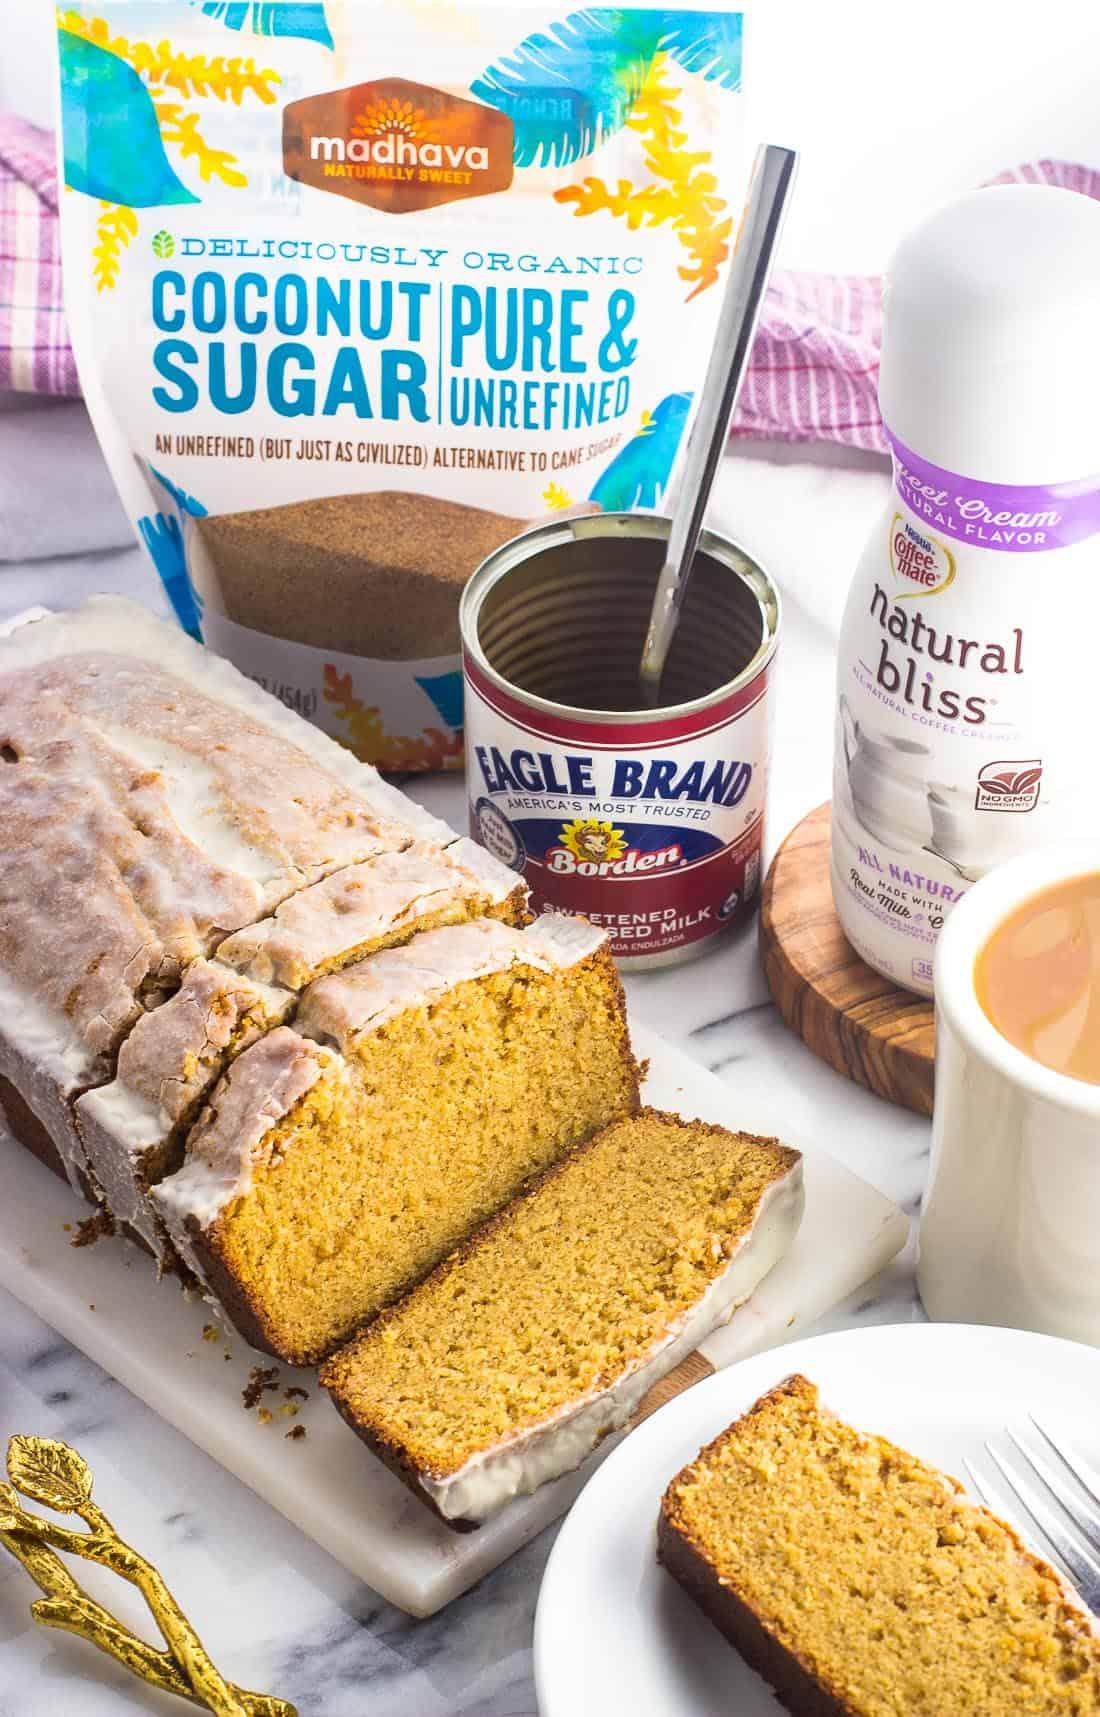 Sliced and glazed pound cake served alongside a cup of coffee